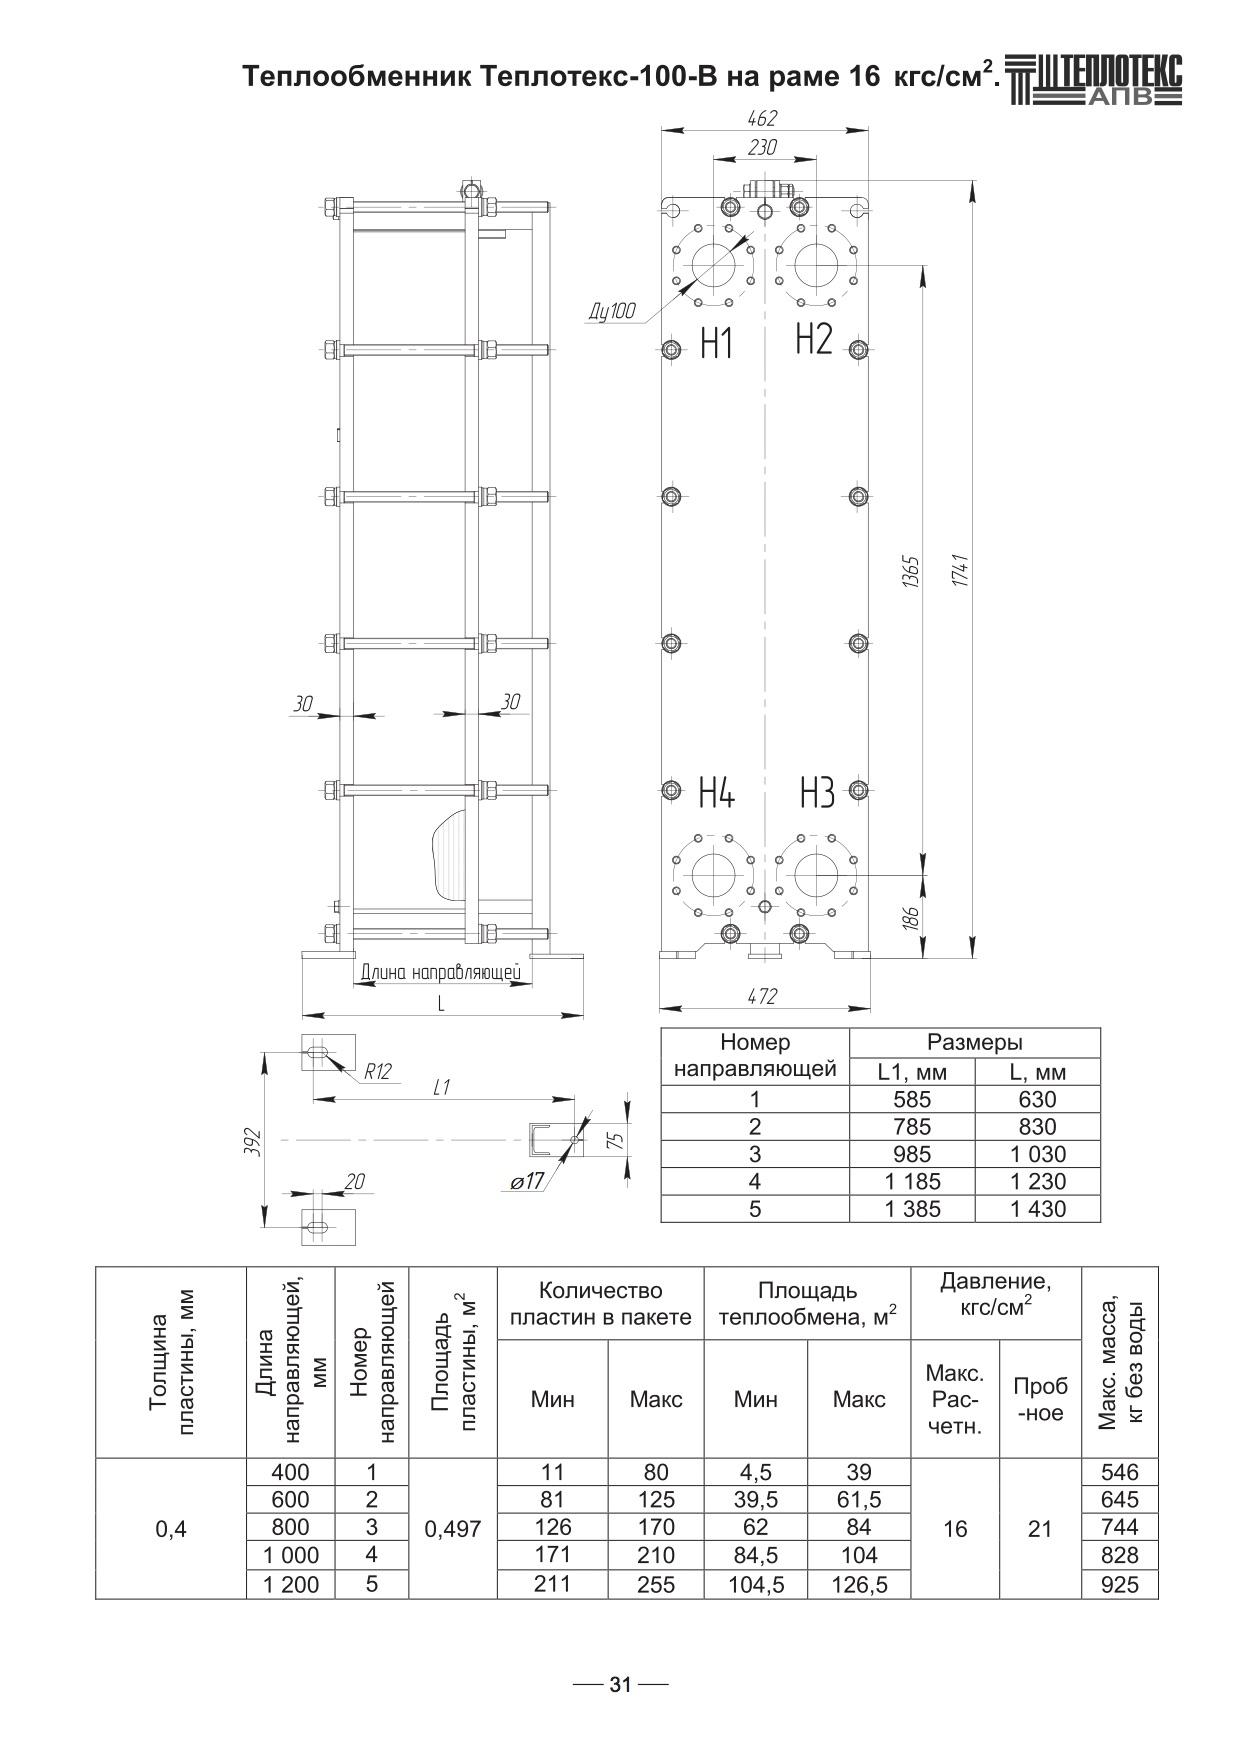 Теплообменник n 35 Уплотнения теплообменника Sondex SF11 Ростов-на-Дону